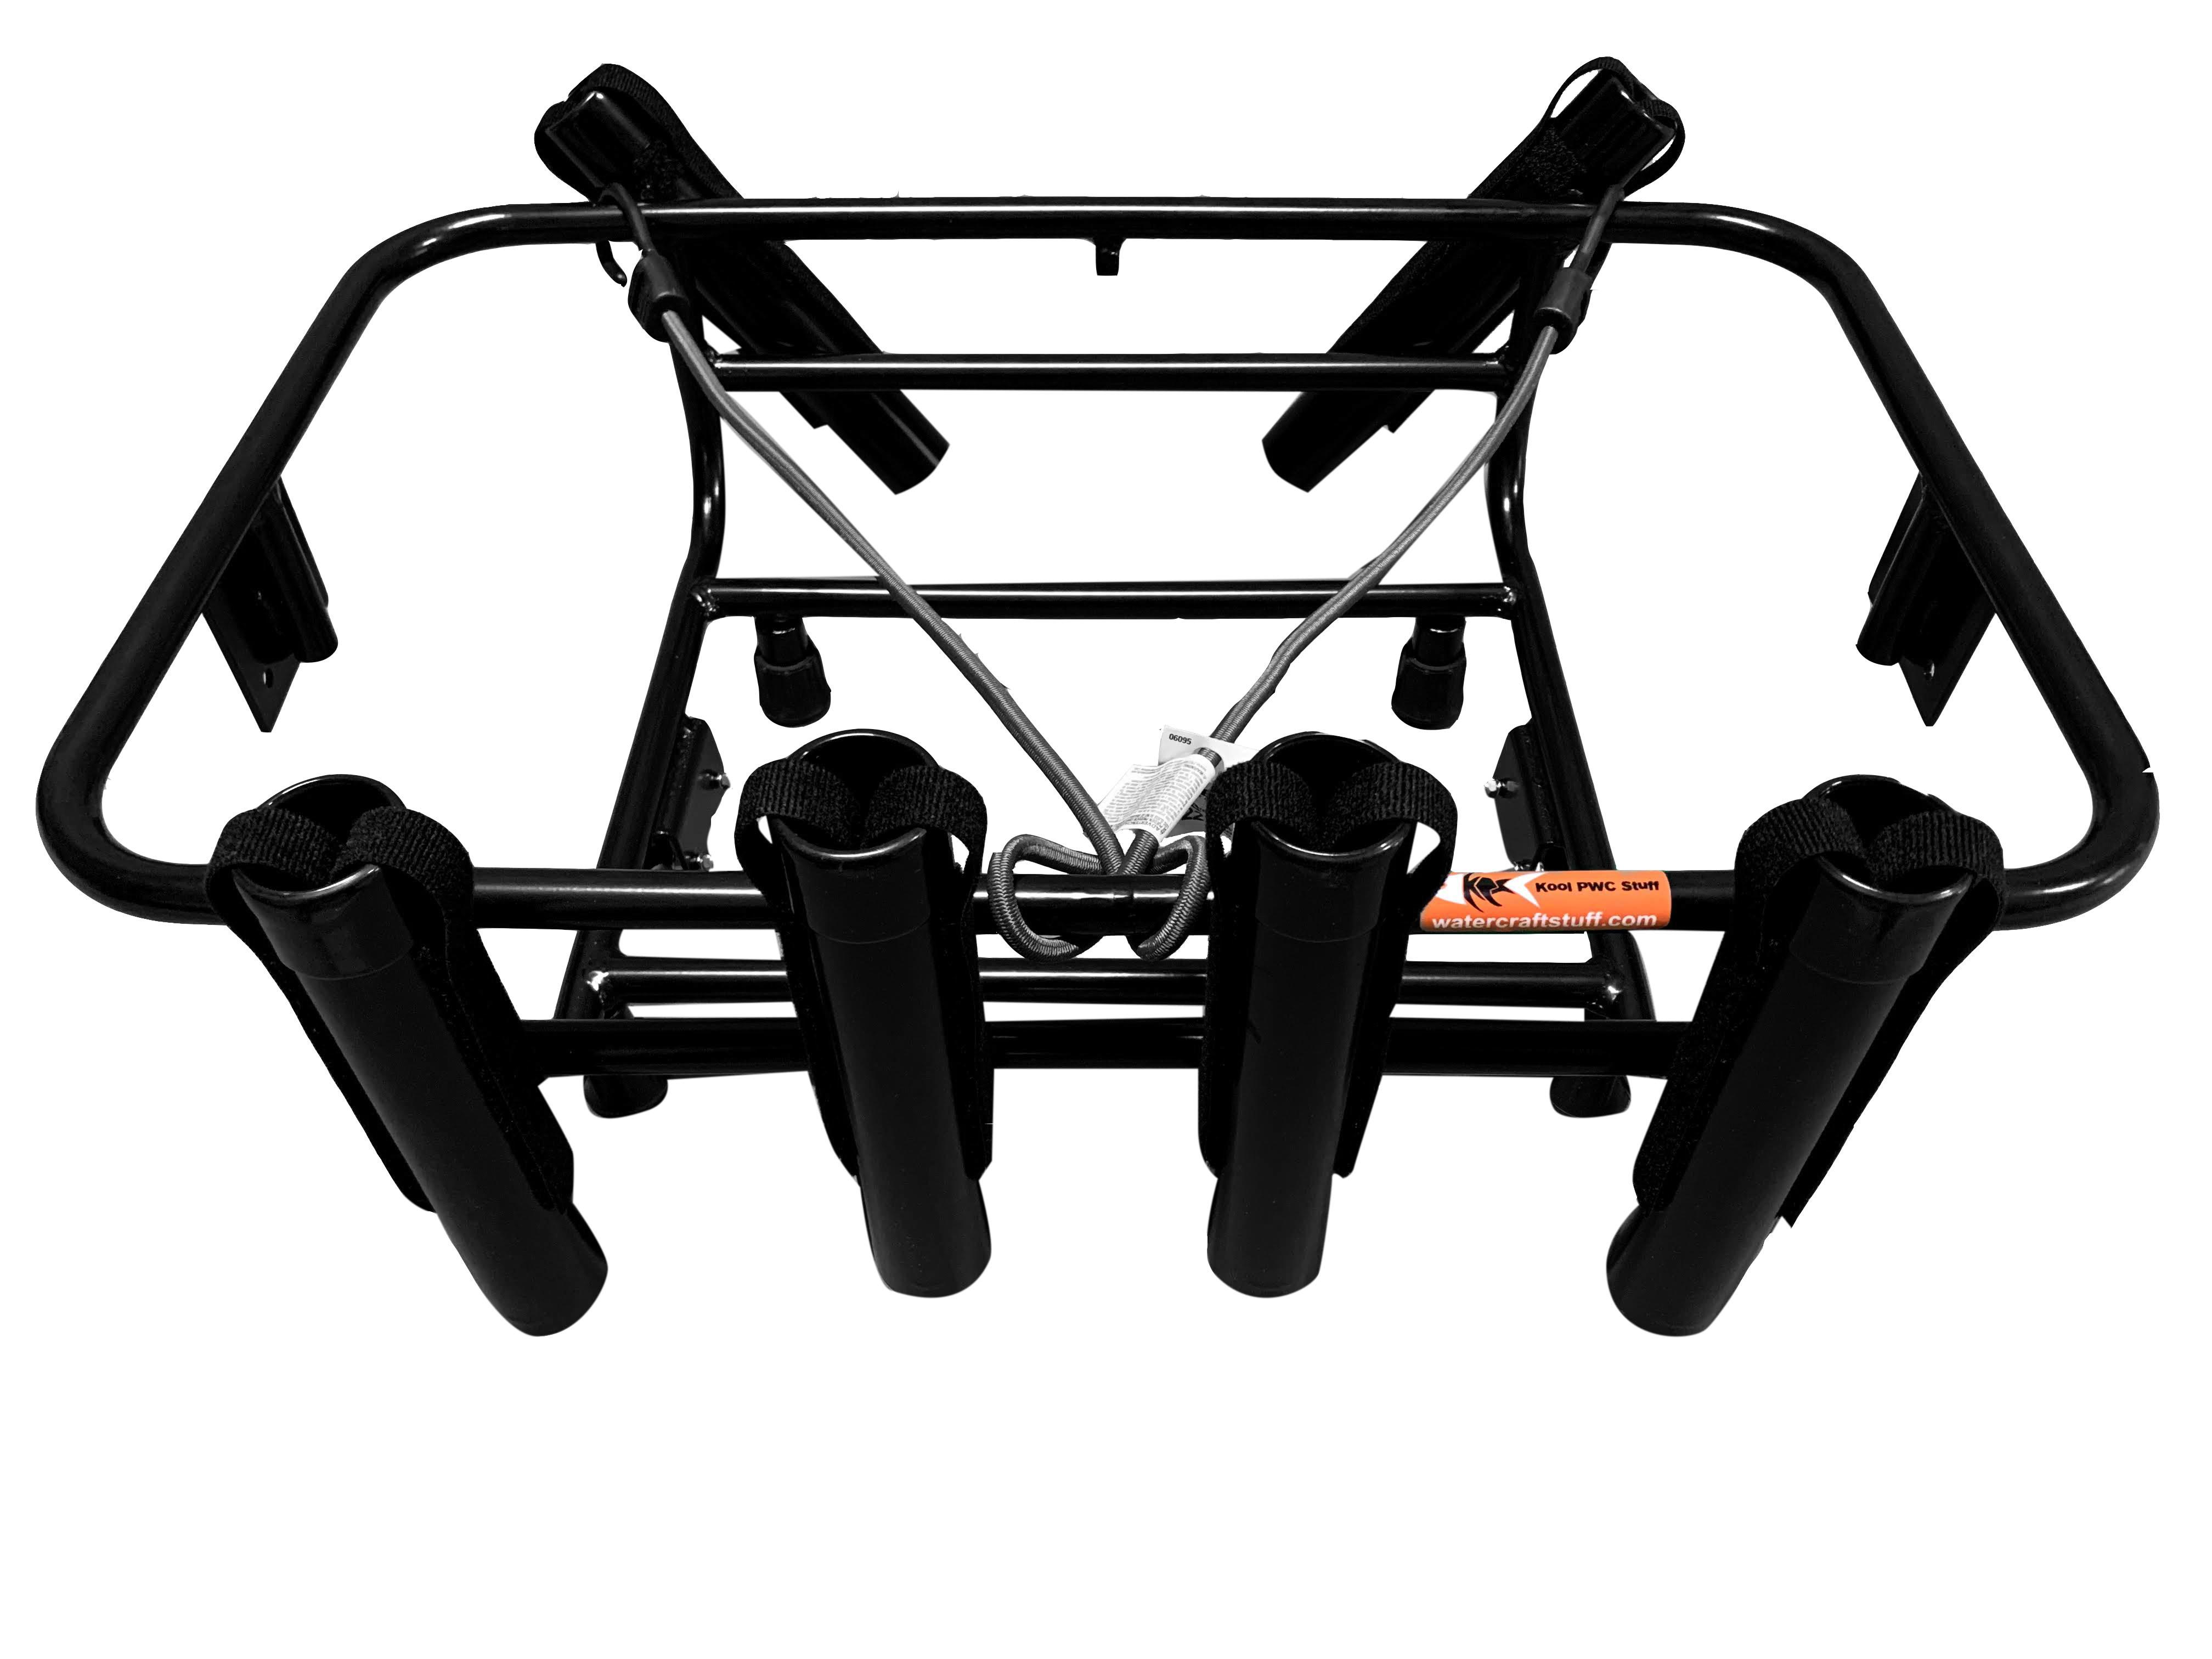 jet ski fishing rack 6 rod holder for sea doo kool pwc stuff